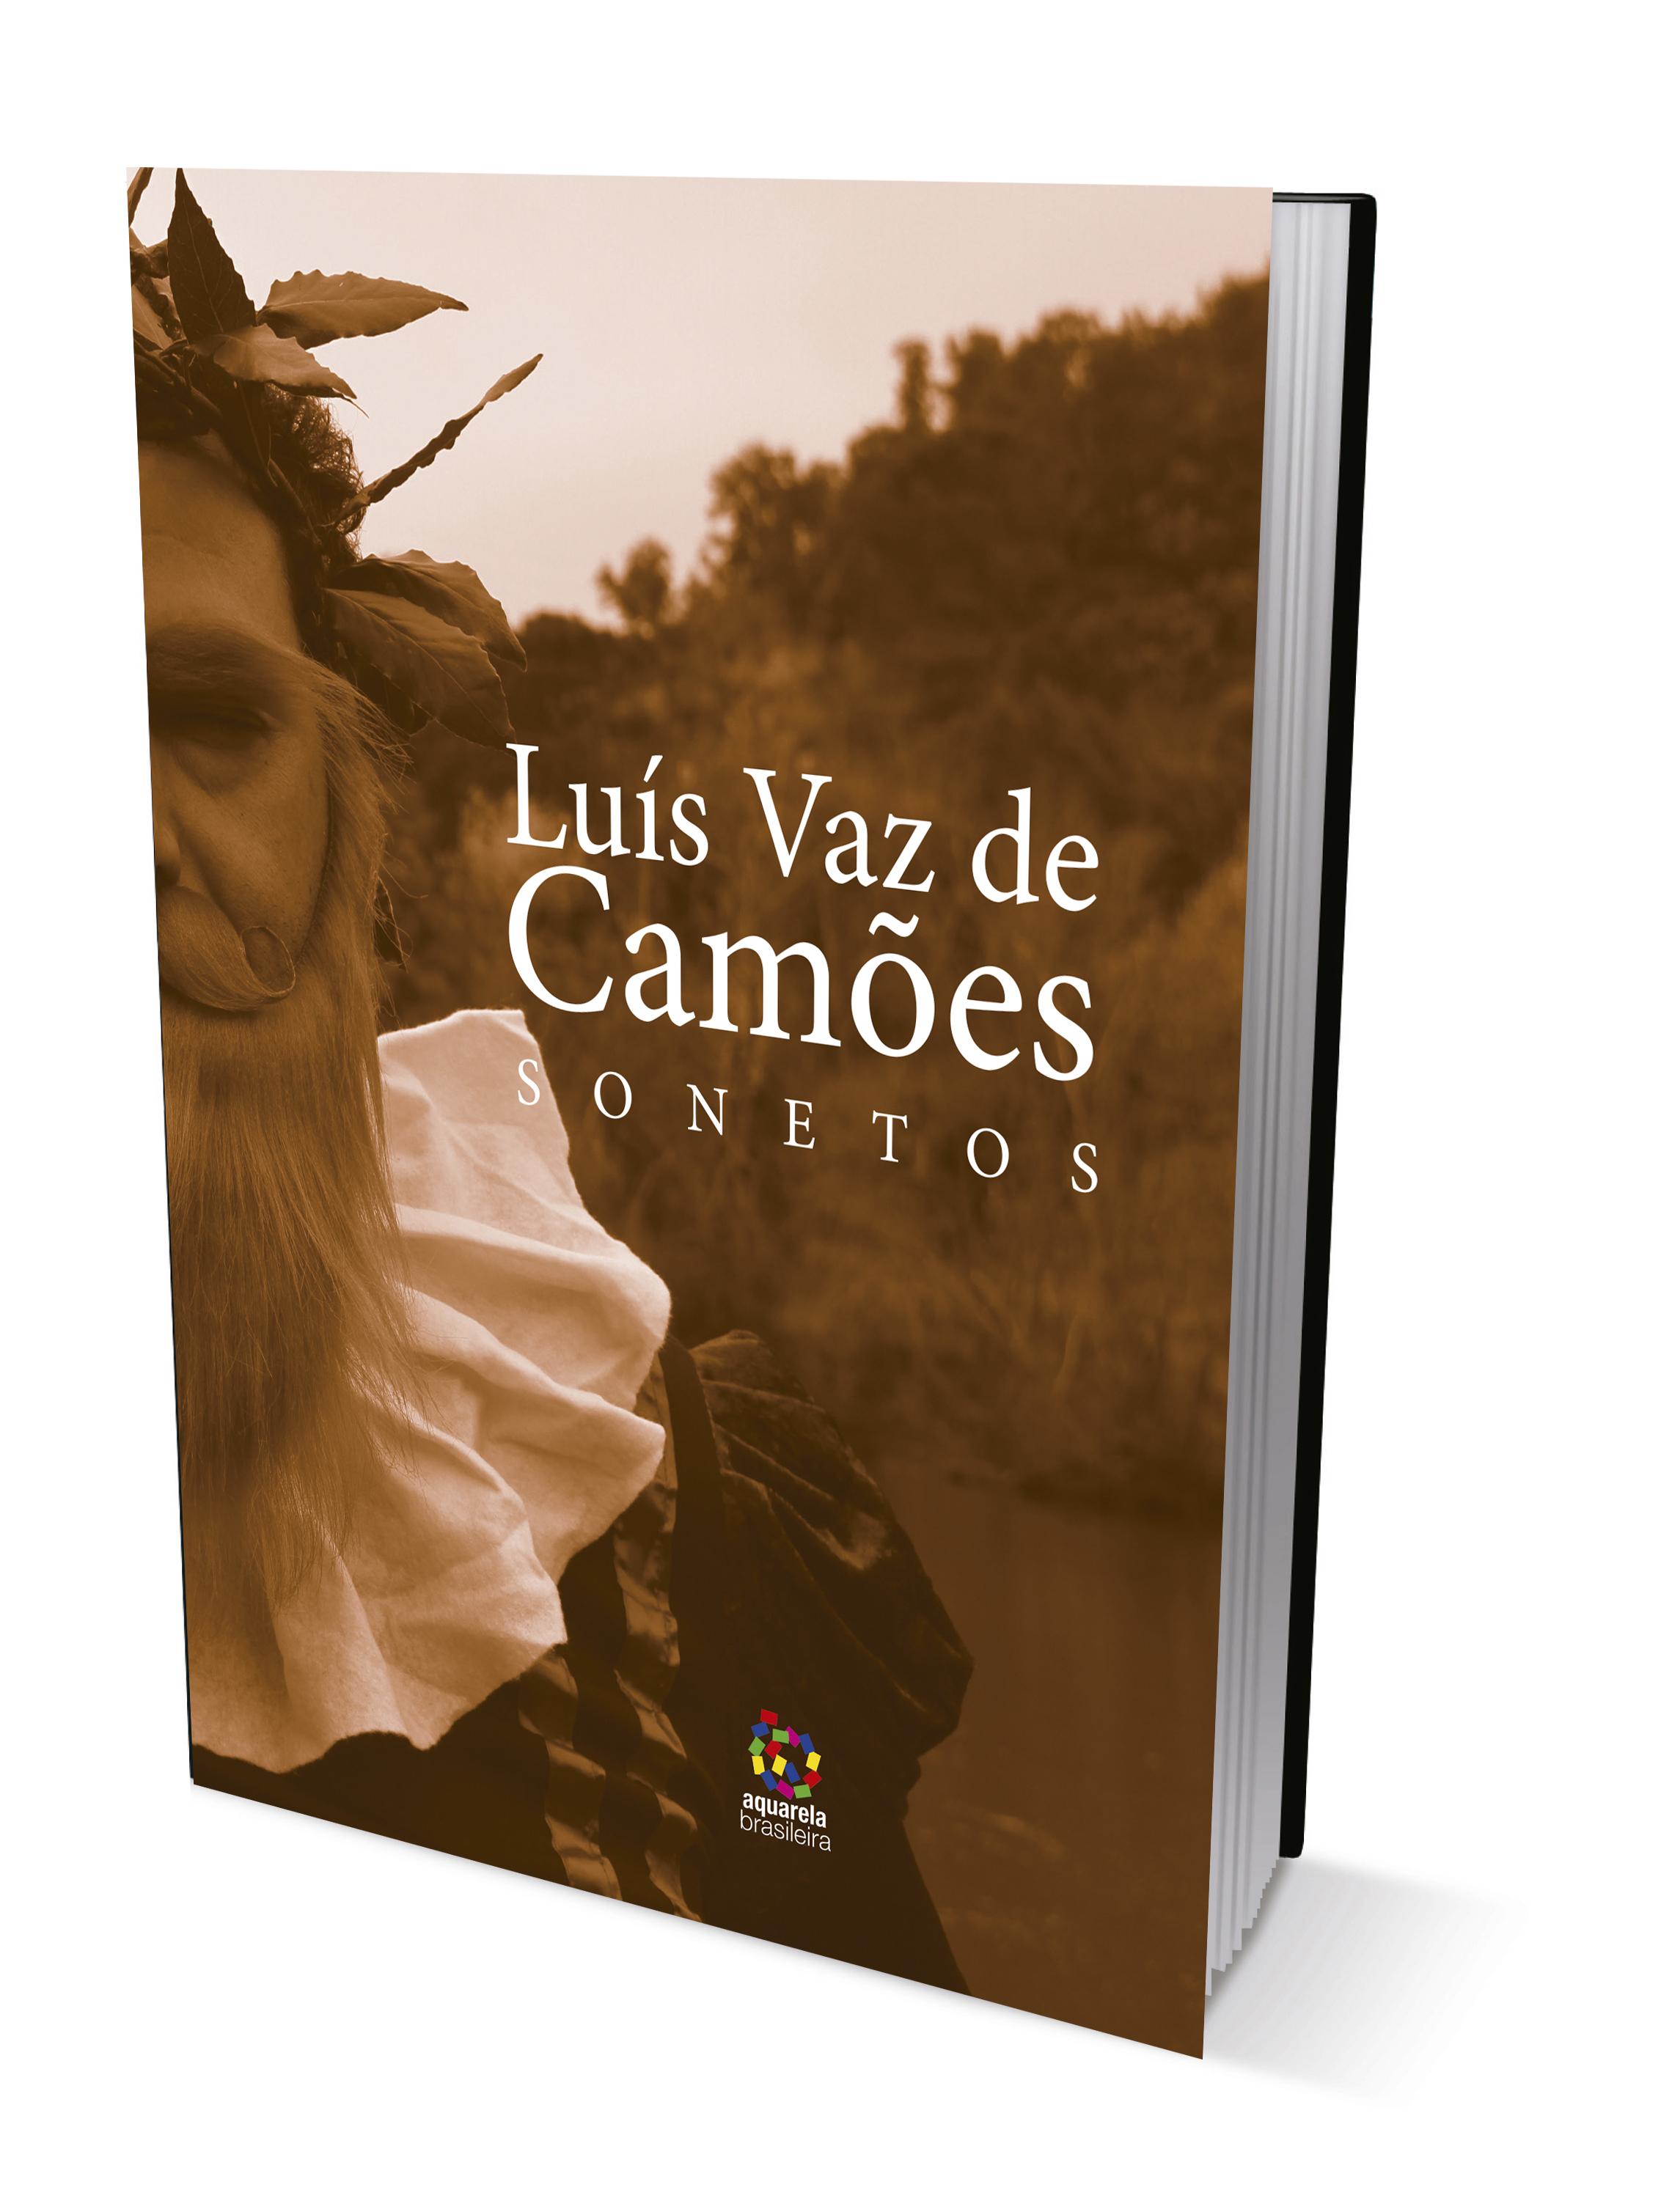 Capa_Sonetos_Luís Vaz de Camões